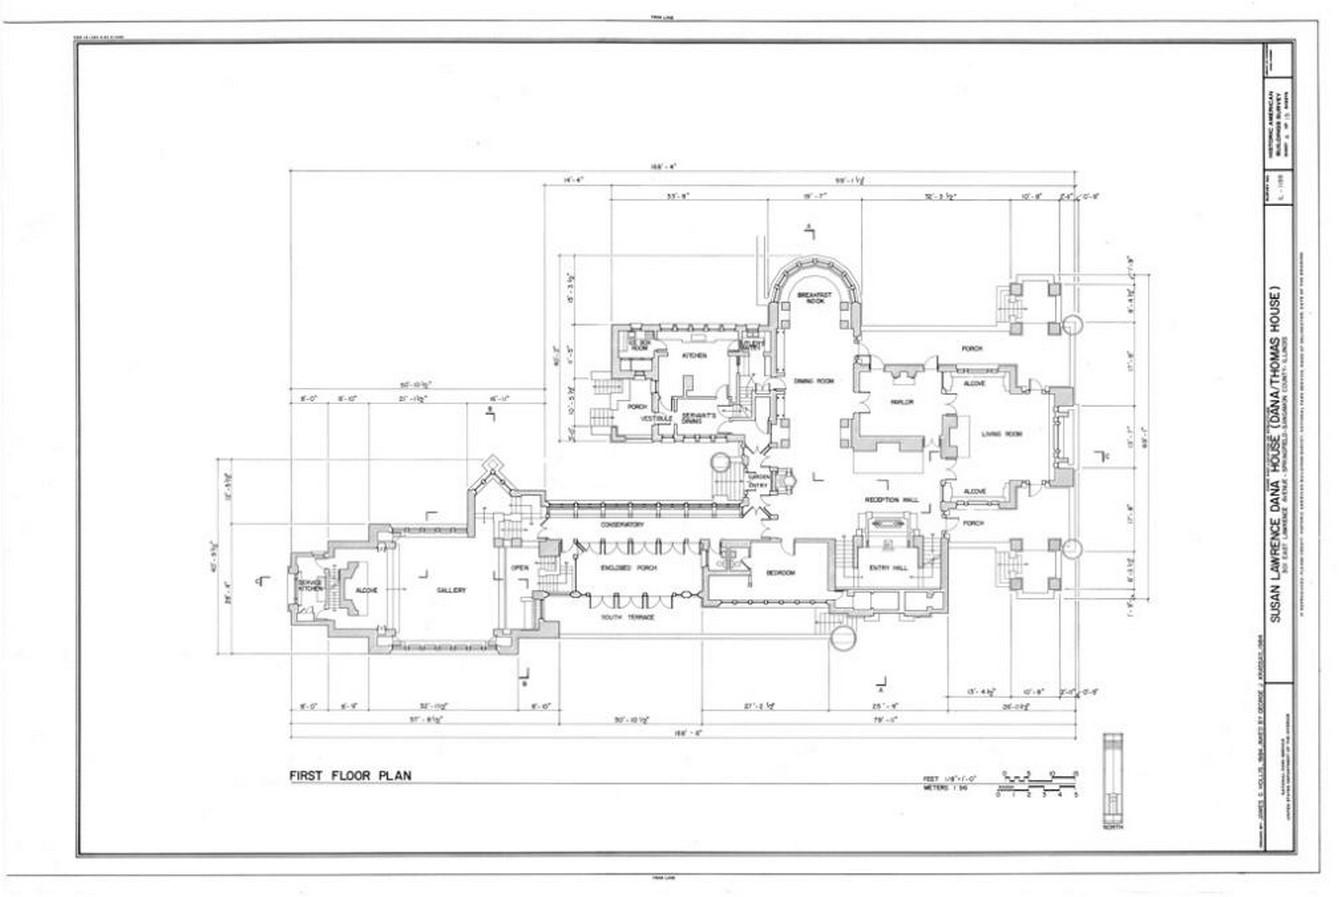 Dana Thomas House by Frank Lloyd Wright: A Prairie School Style House - Sheet9